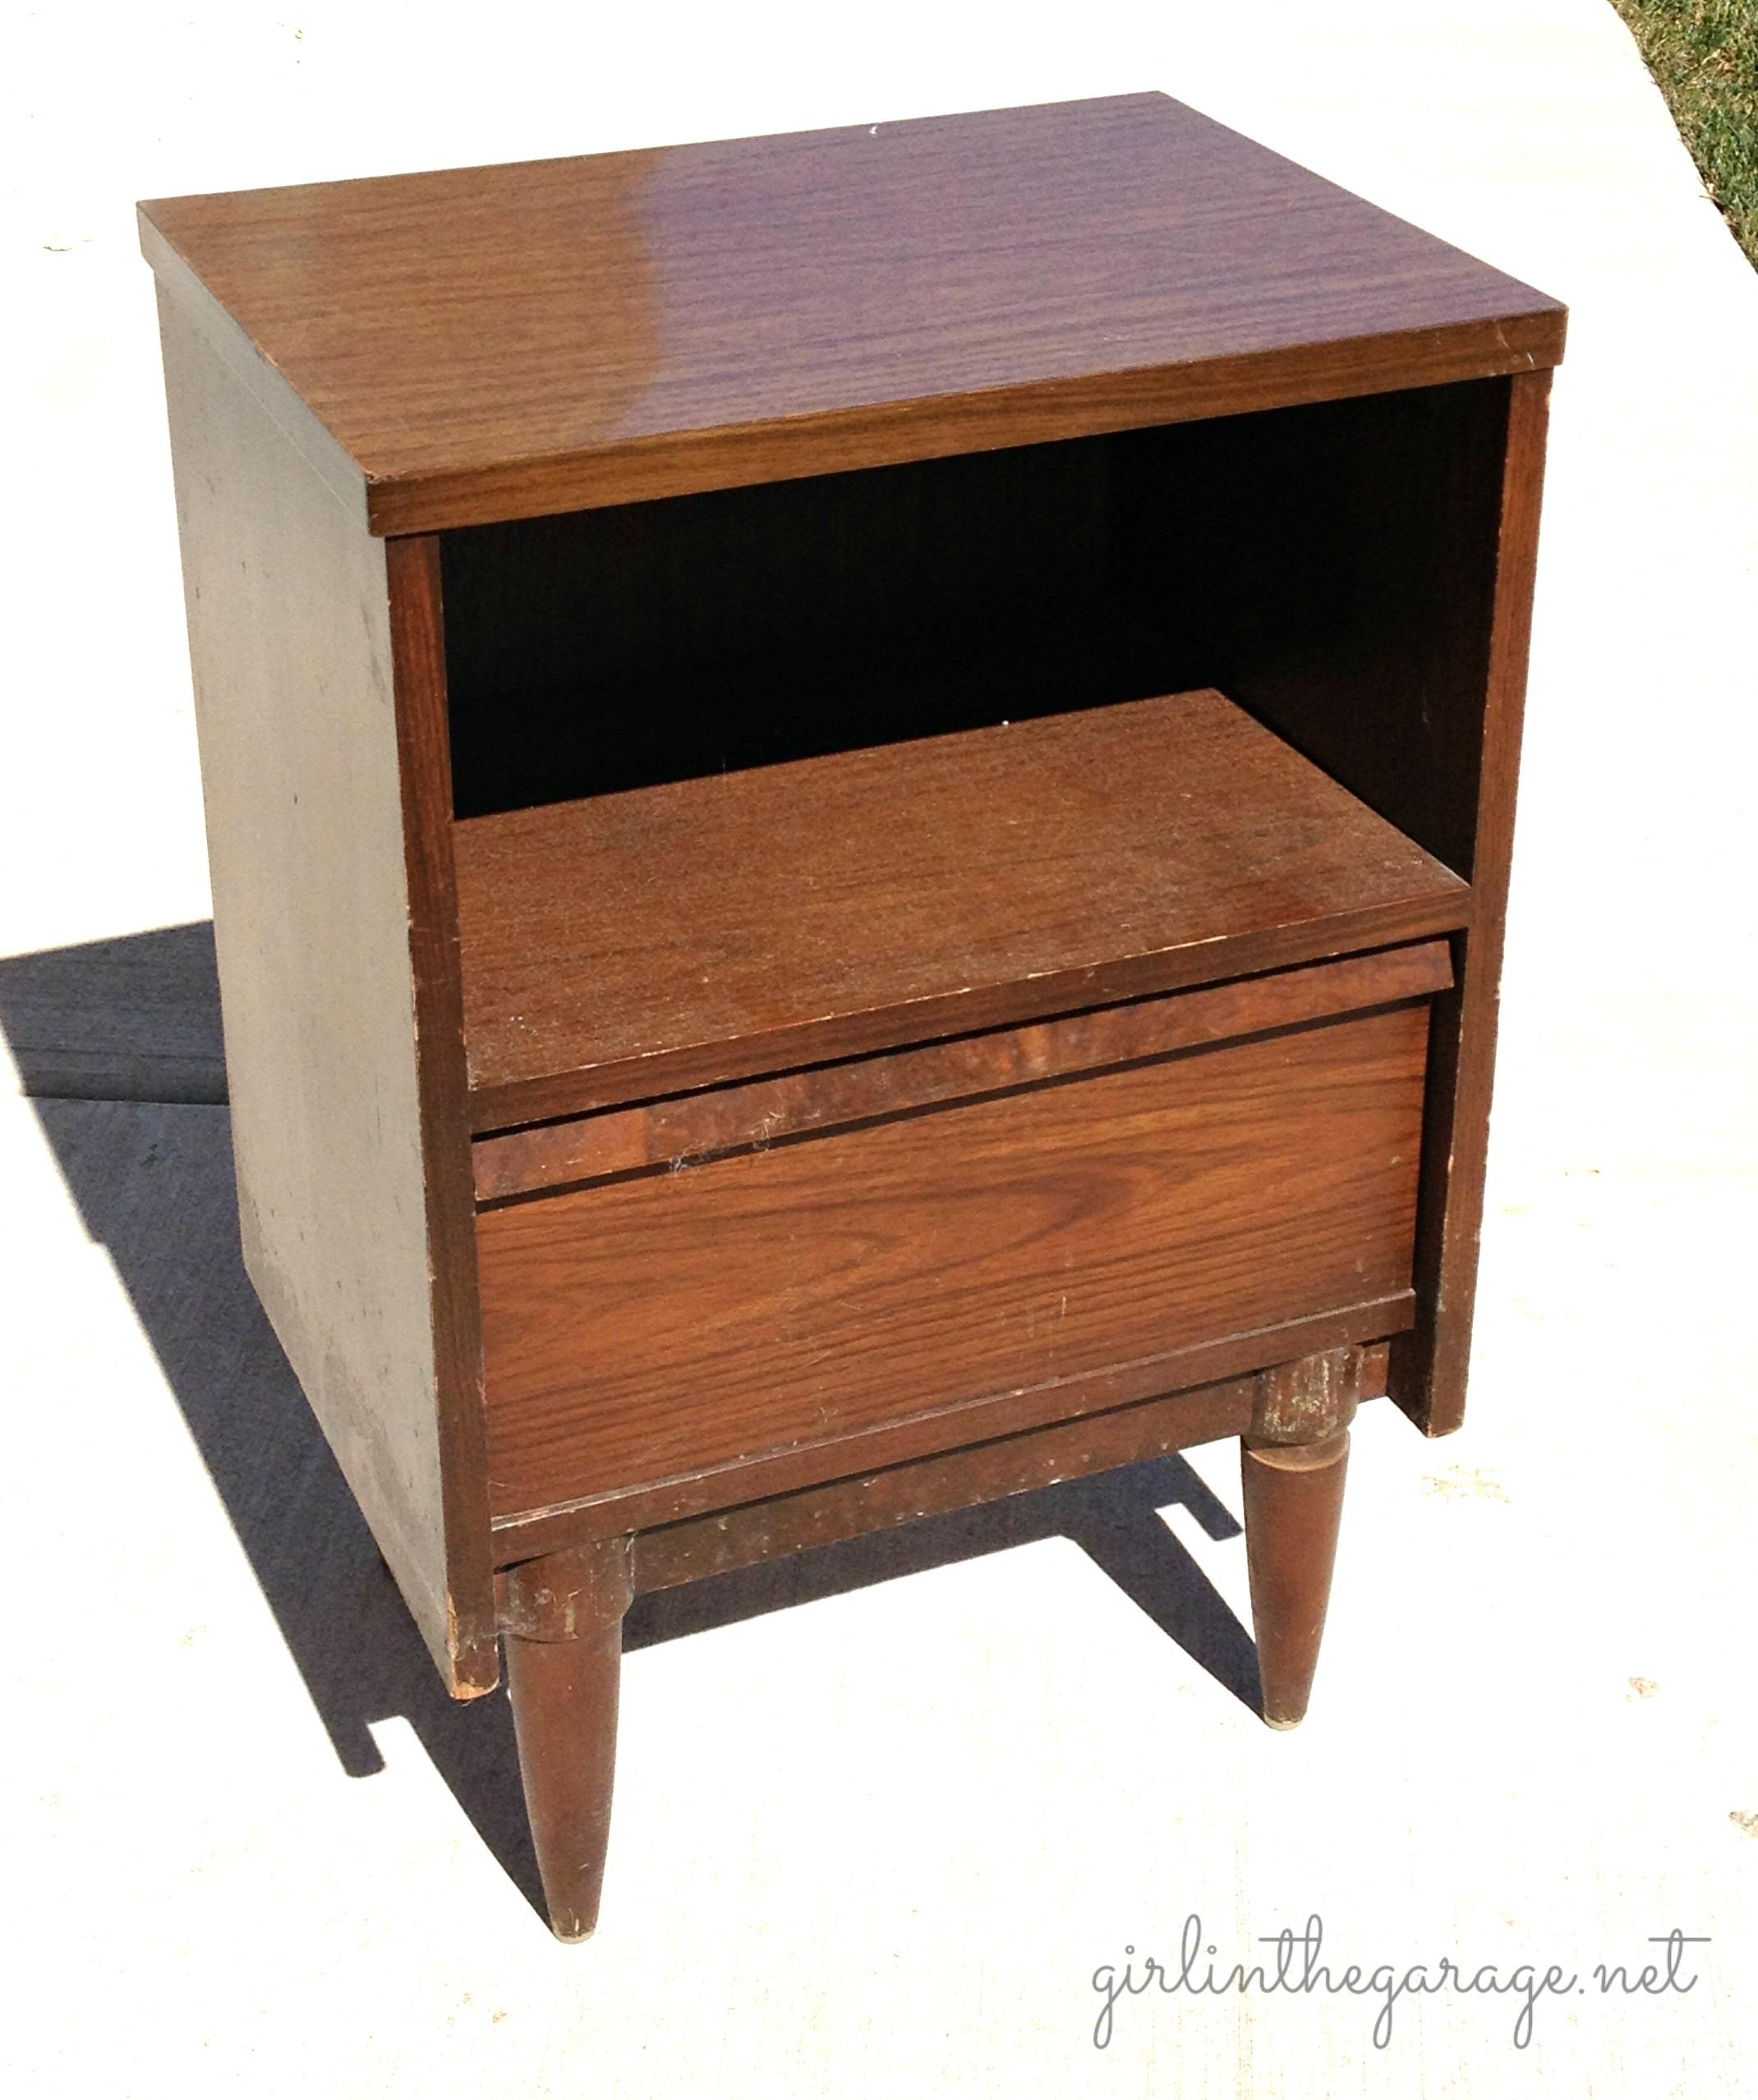 12 Yard Sale Furniture Makeovers on Vintage Furniture Vanity